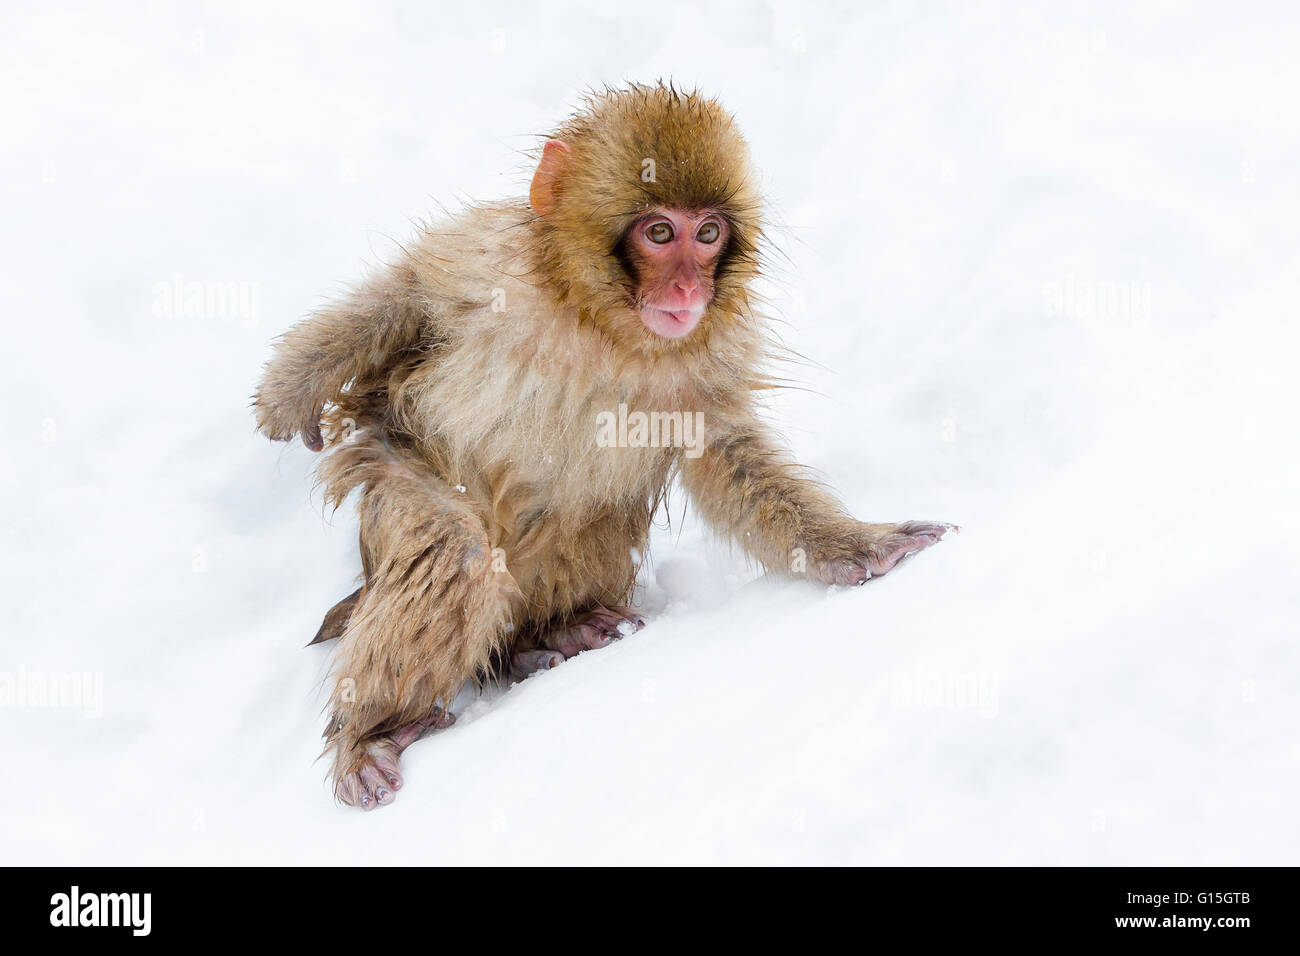 Japanese macaque (Snow monkey) (Macata fuscata), in the snow, Jigokudani Yaen-Koen, Nagano Prefecture, Japan, Asia Stock Photo